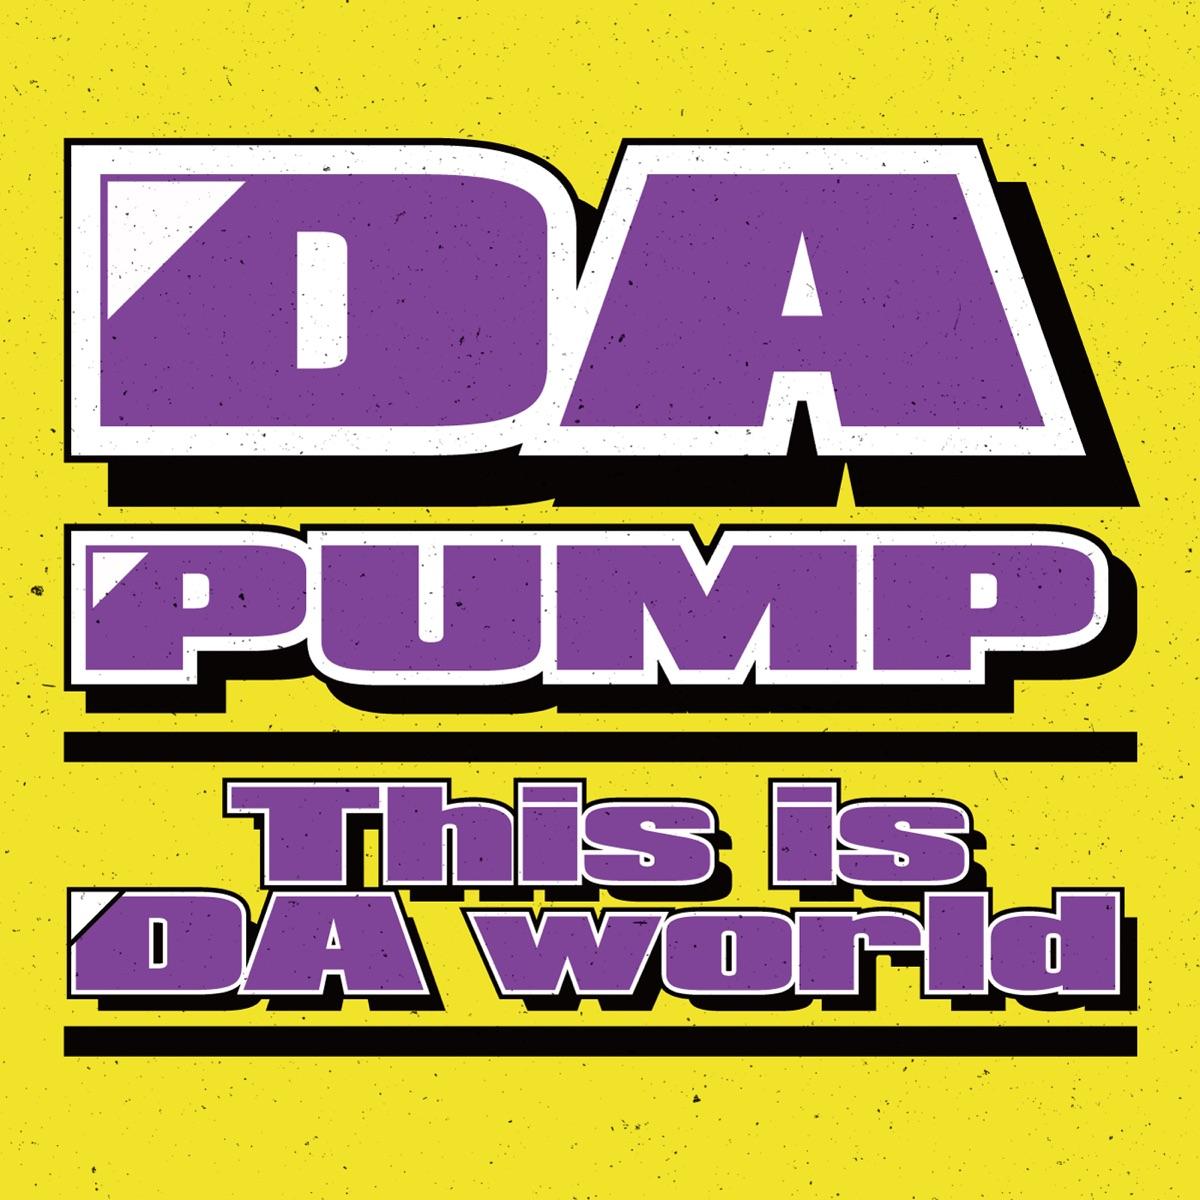 『DA PUMP - This is DA World』収録の『This is DA World』ジャケット